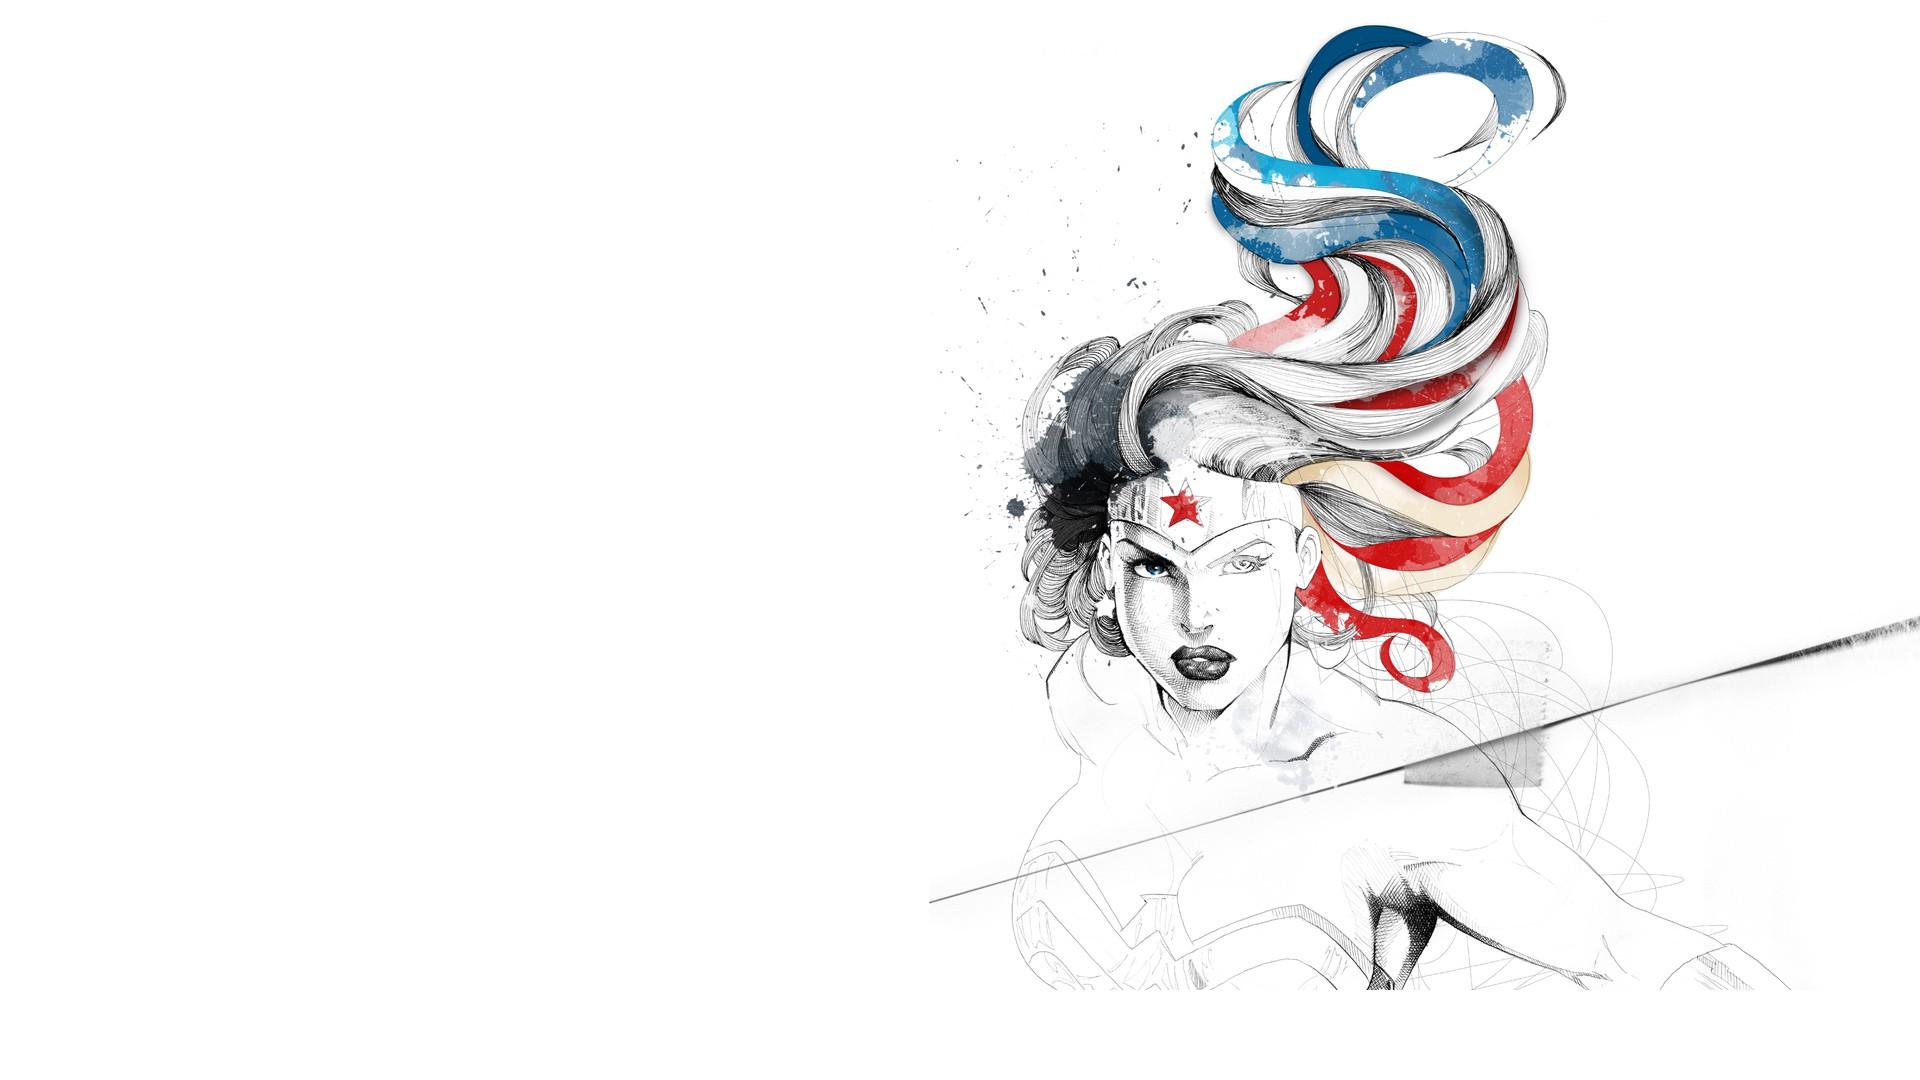 DC ics Wonder Woman d c superhero girl gw wallpaper